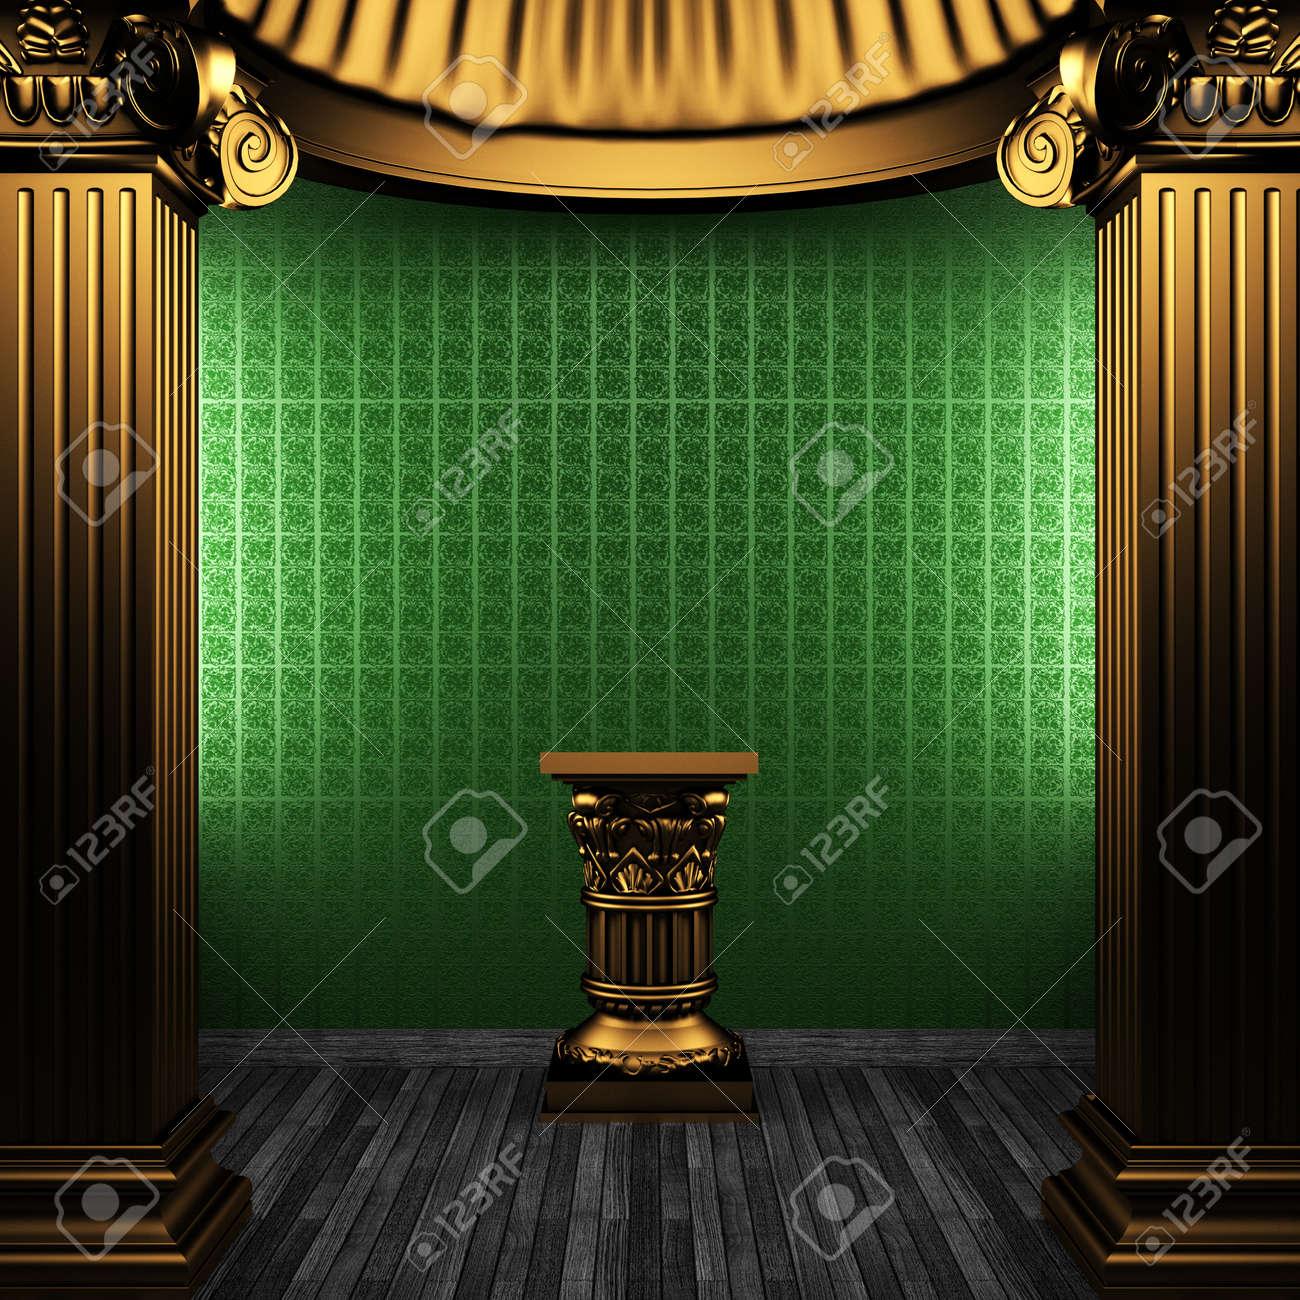 bronze columns, pedestal and wallpaper made in 3D Stock Photo - 8471238